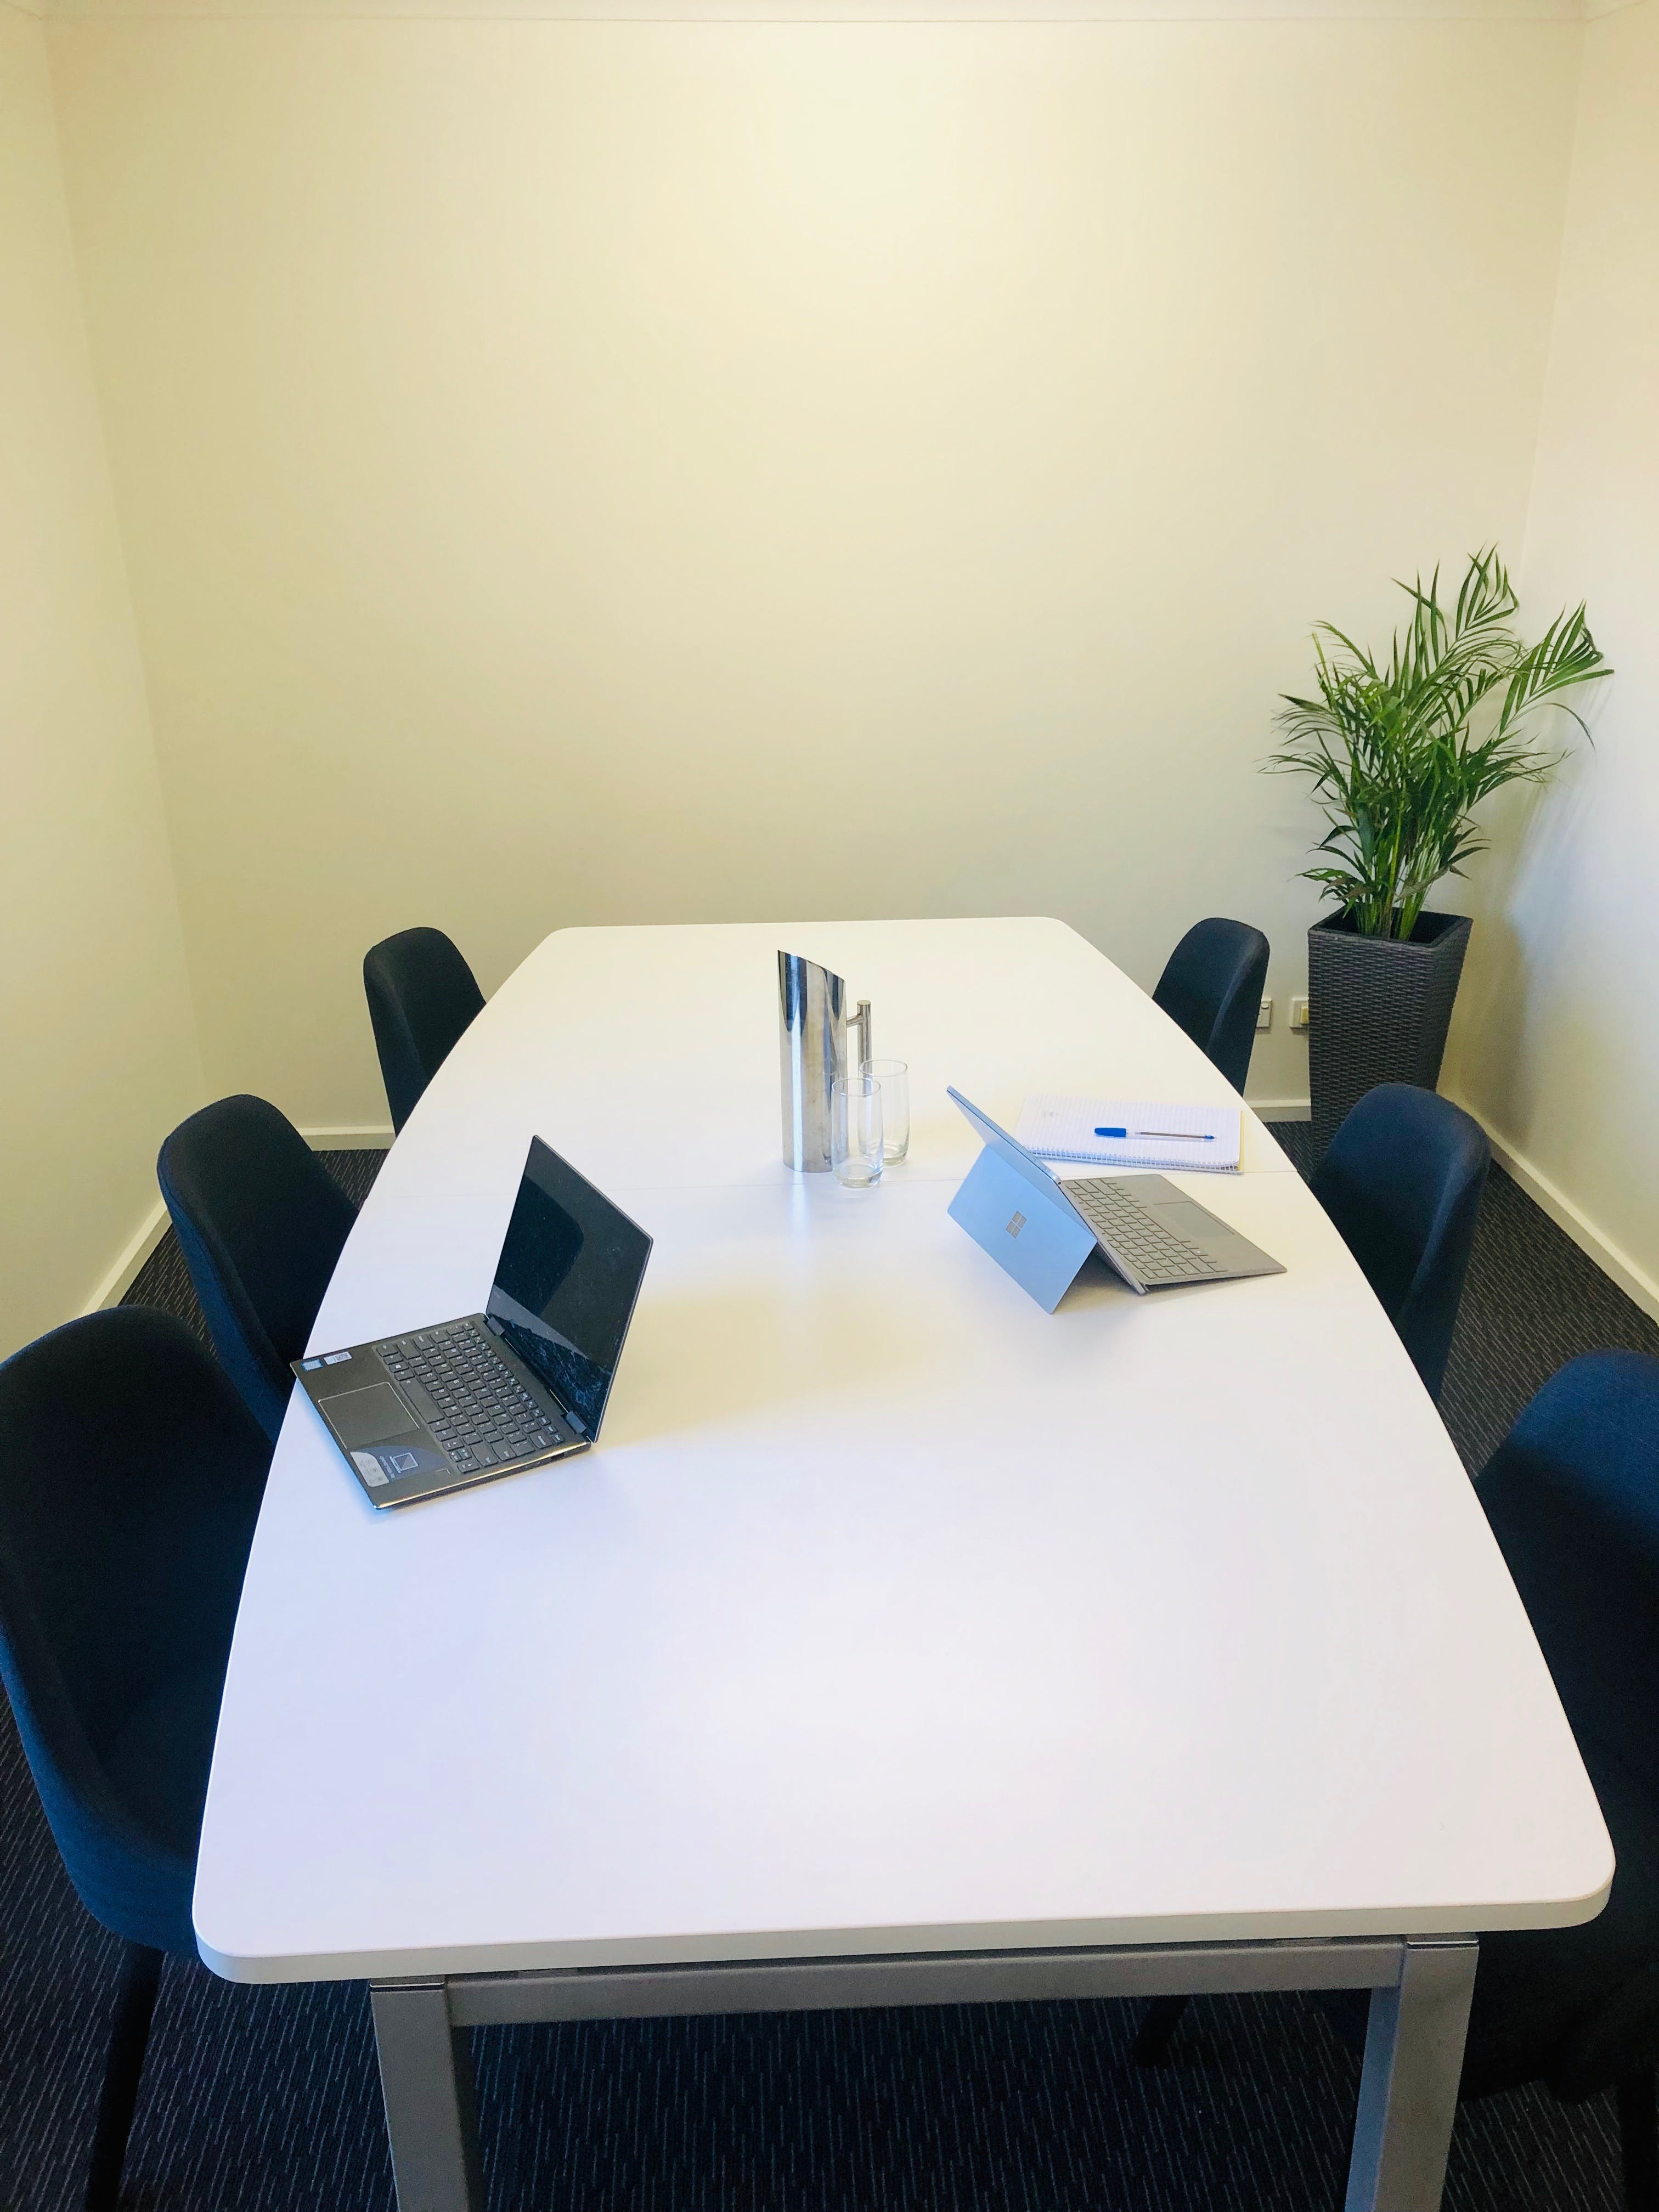 Professional Boardroom hire, meeting room at Rocket WorkSpaces, image 1